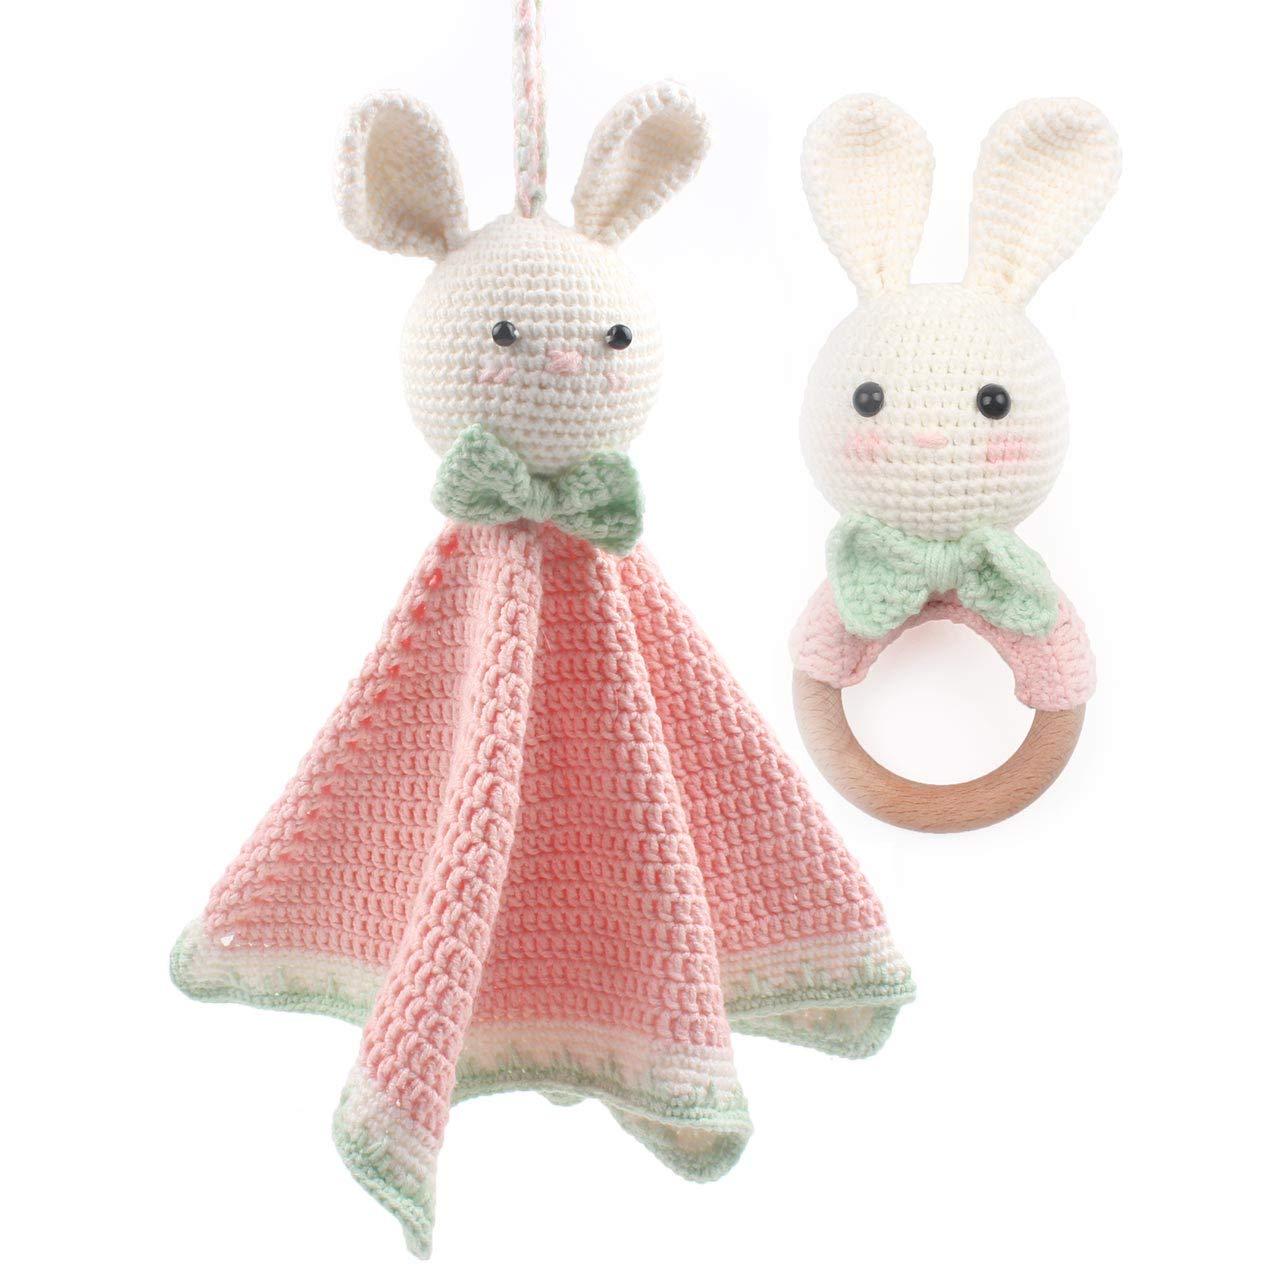 Knit Bunny Blanket Pattern | 1000 Free Patterns